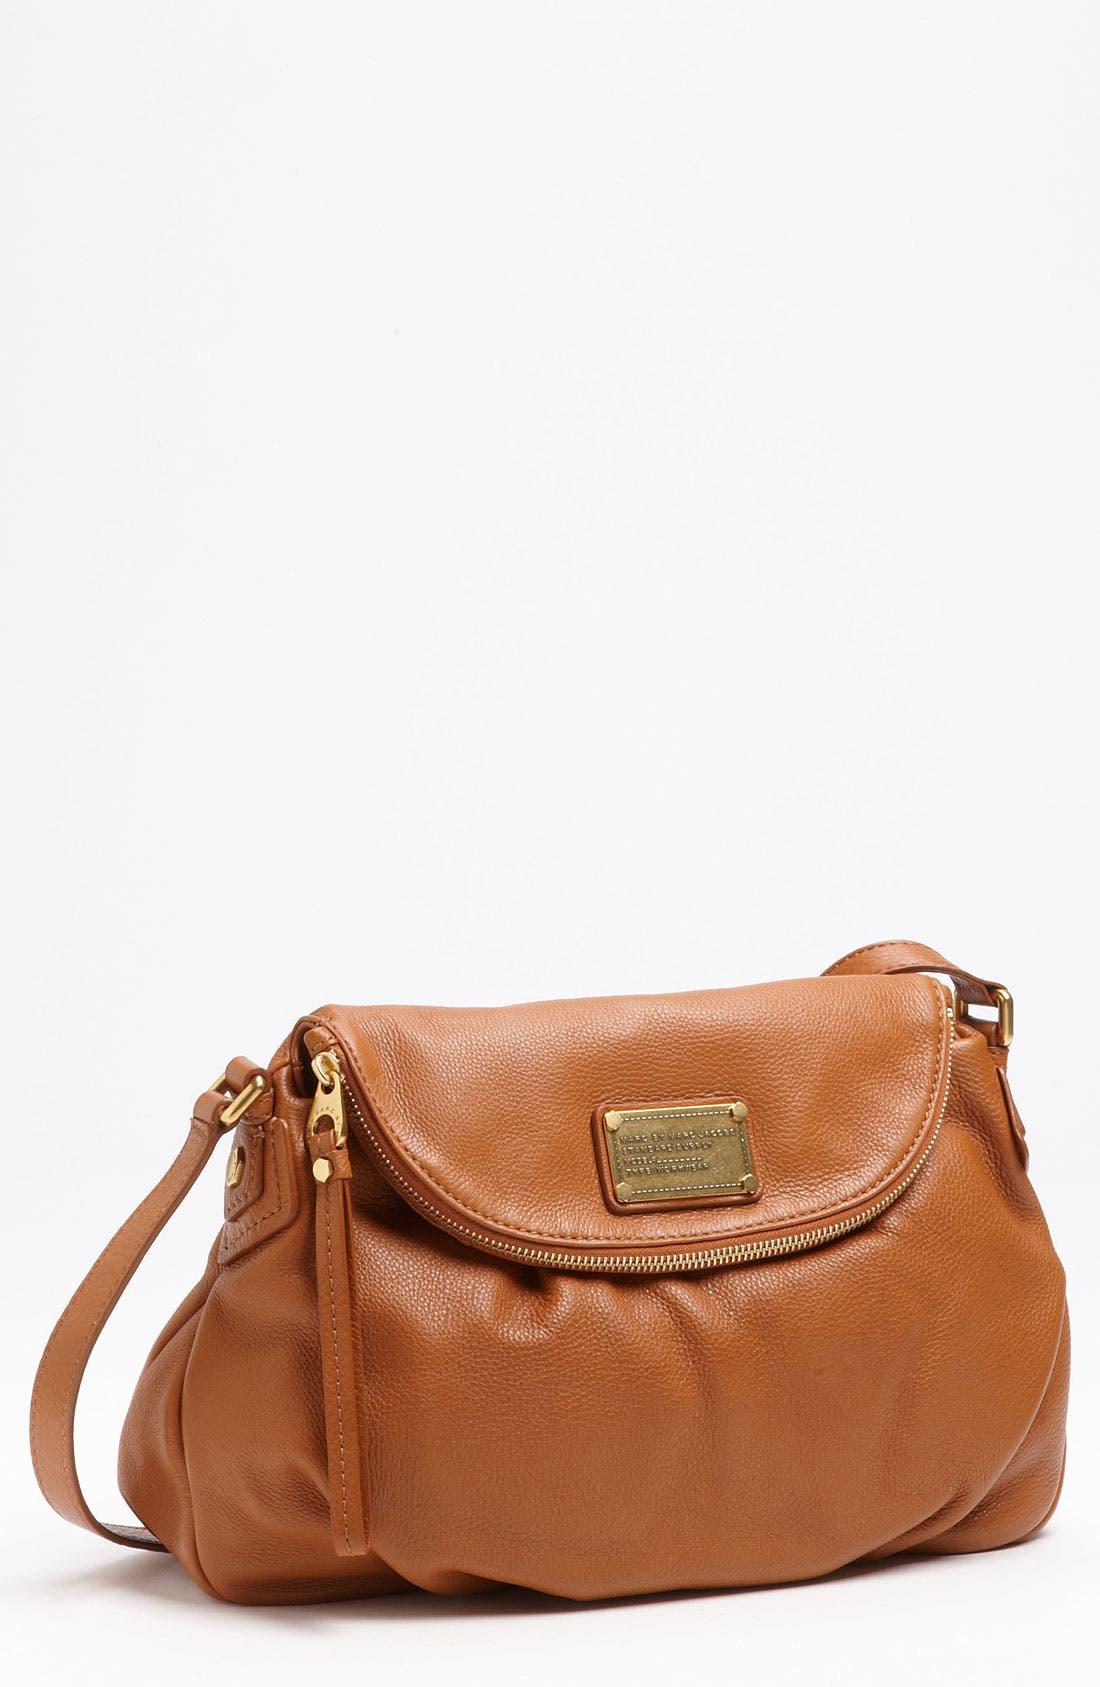 Alternate Image 1 Selected - MARC BY MARC JACOBS 'Classic Q - Natasha' Crossbody Flap Bag